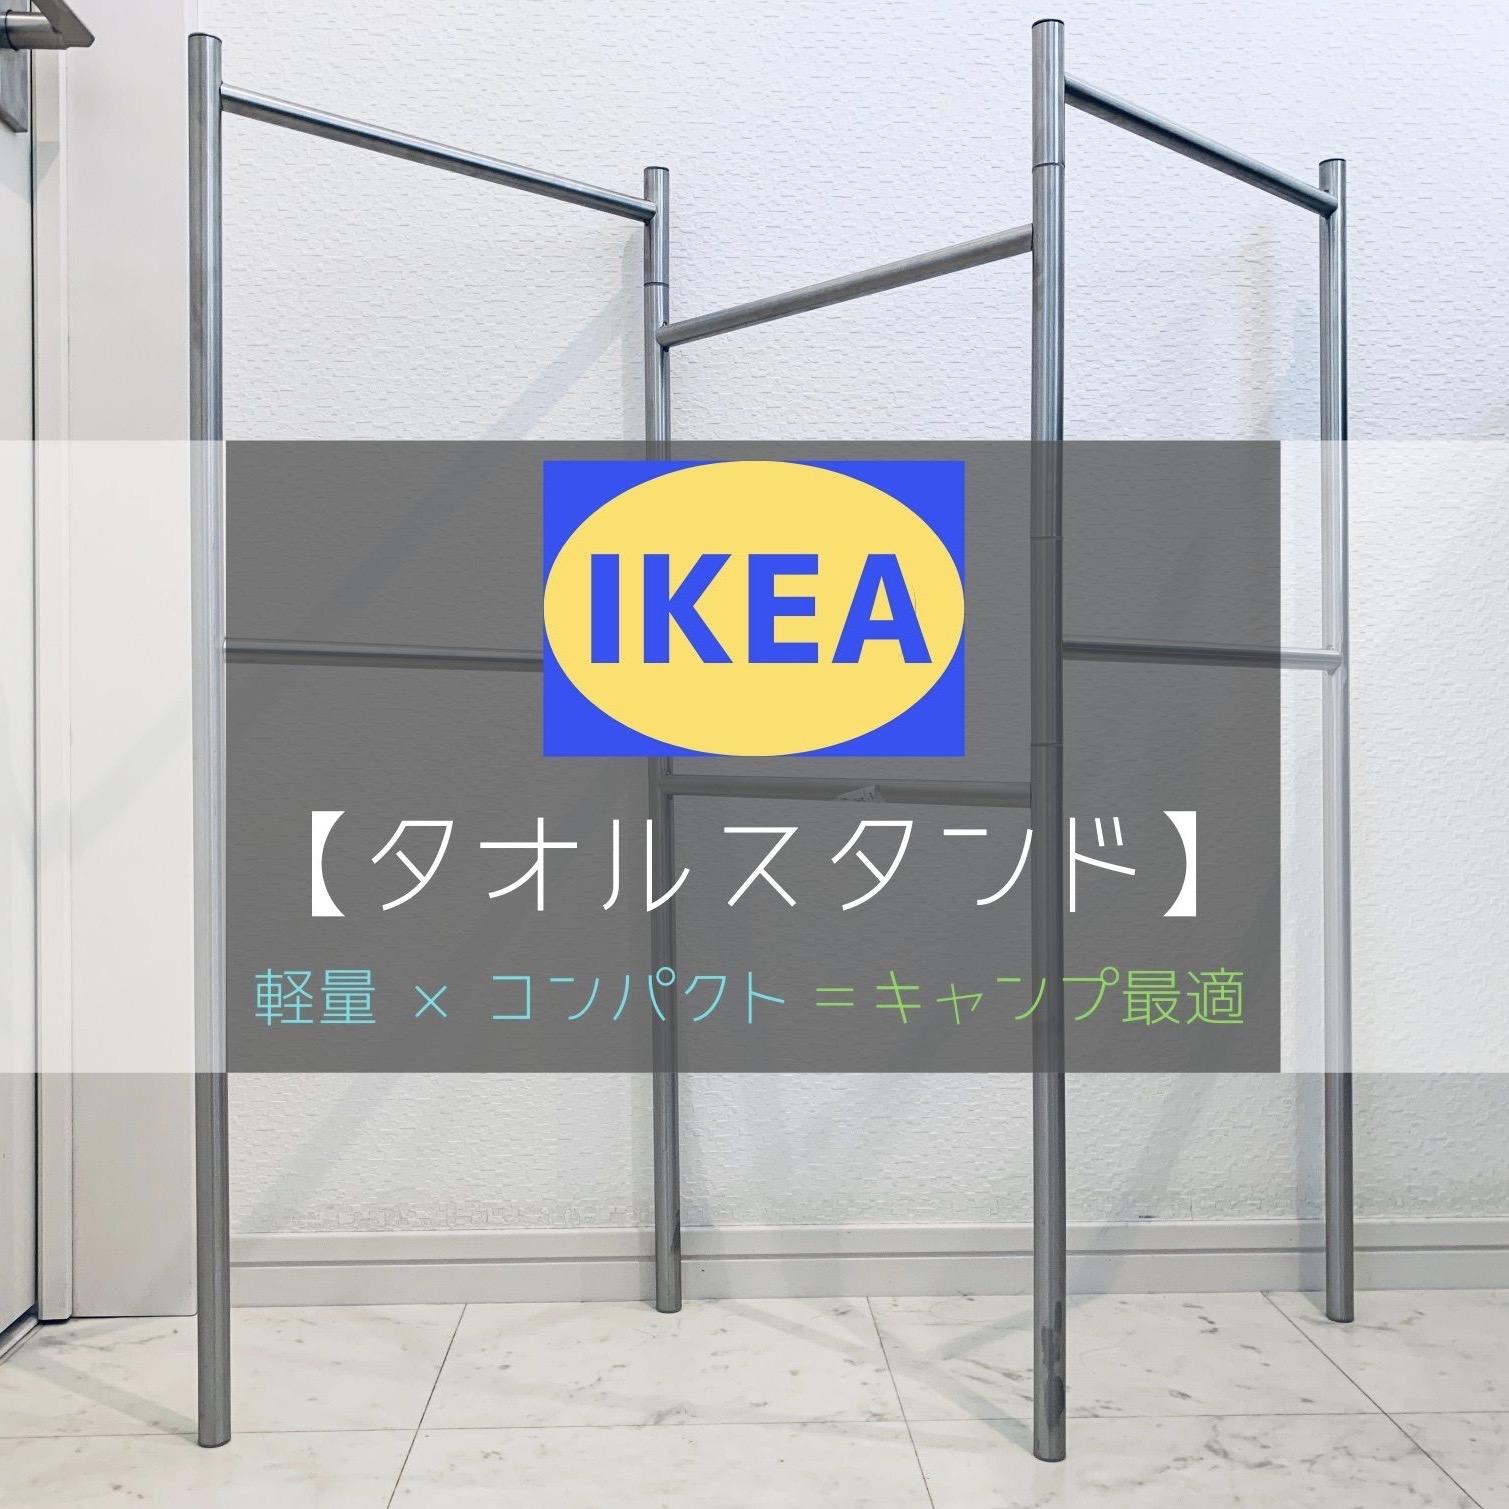 【IKEA】イケアのタオルスタンドはキャンプに最適!軽量コンパクトなステンレス製